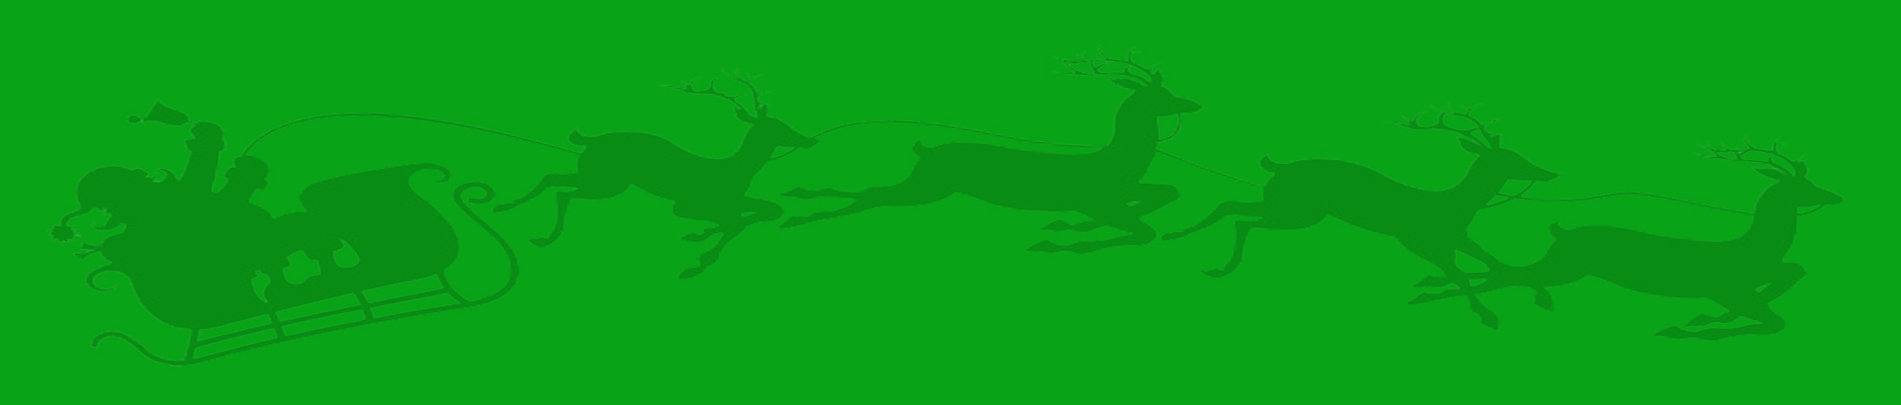 Santa Green.jpg